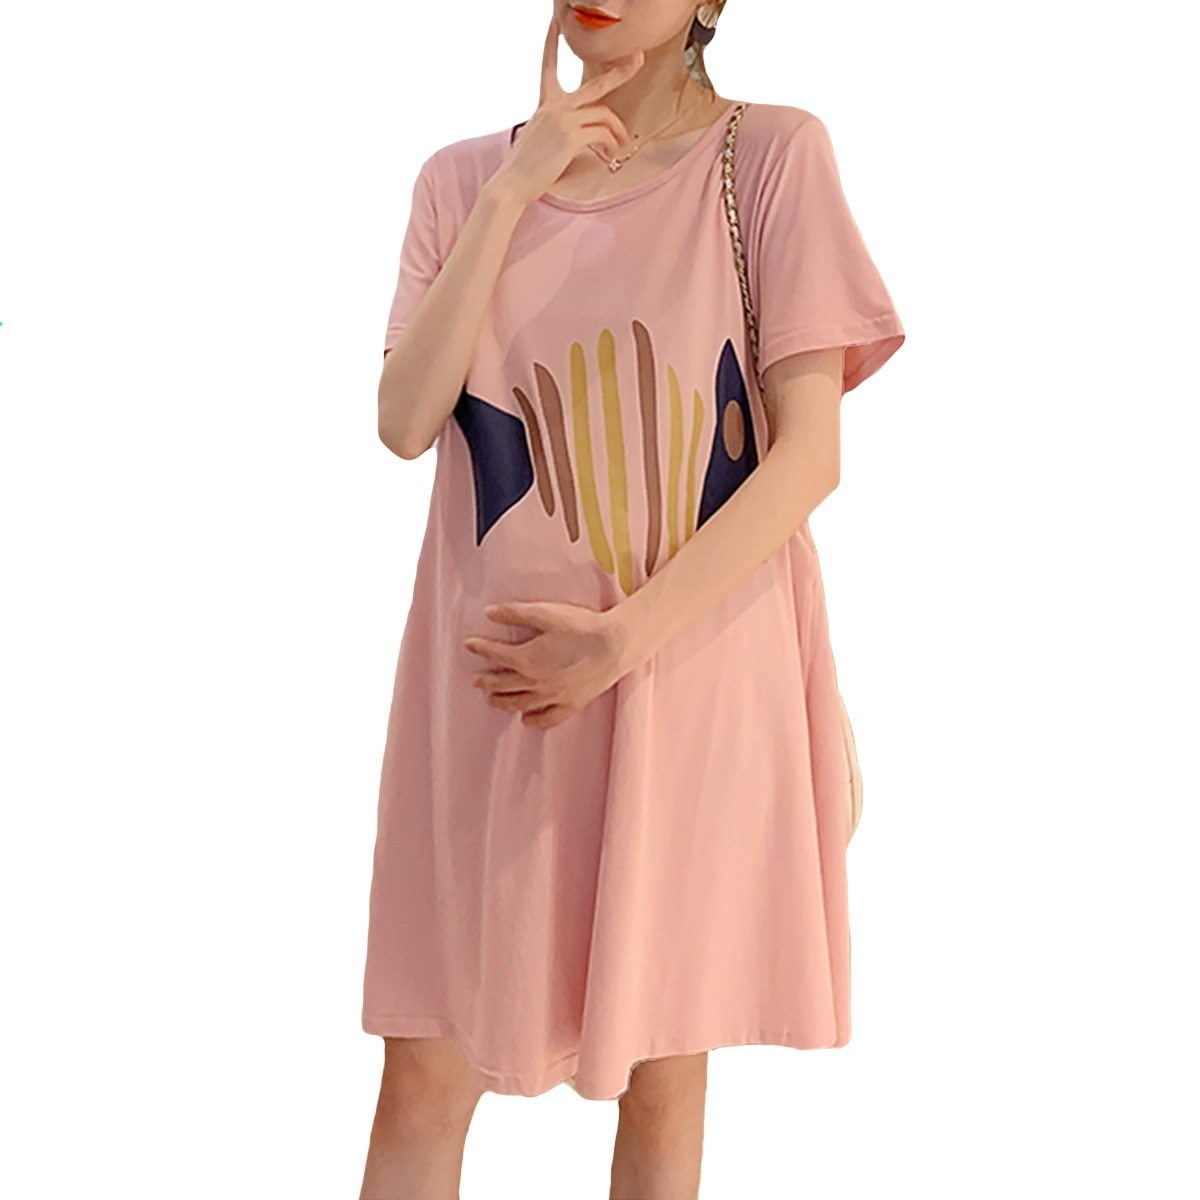 Maternity Dress Cartoon Simple Short Sleeve Loose Comfy Dress